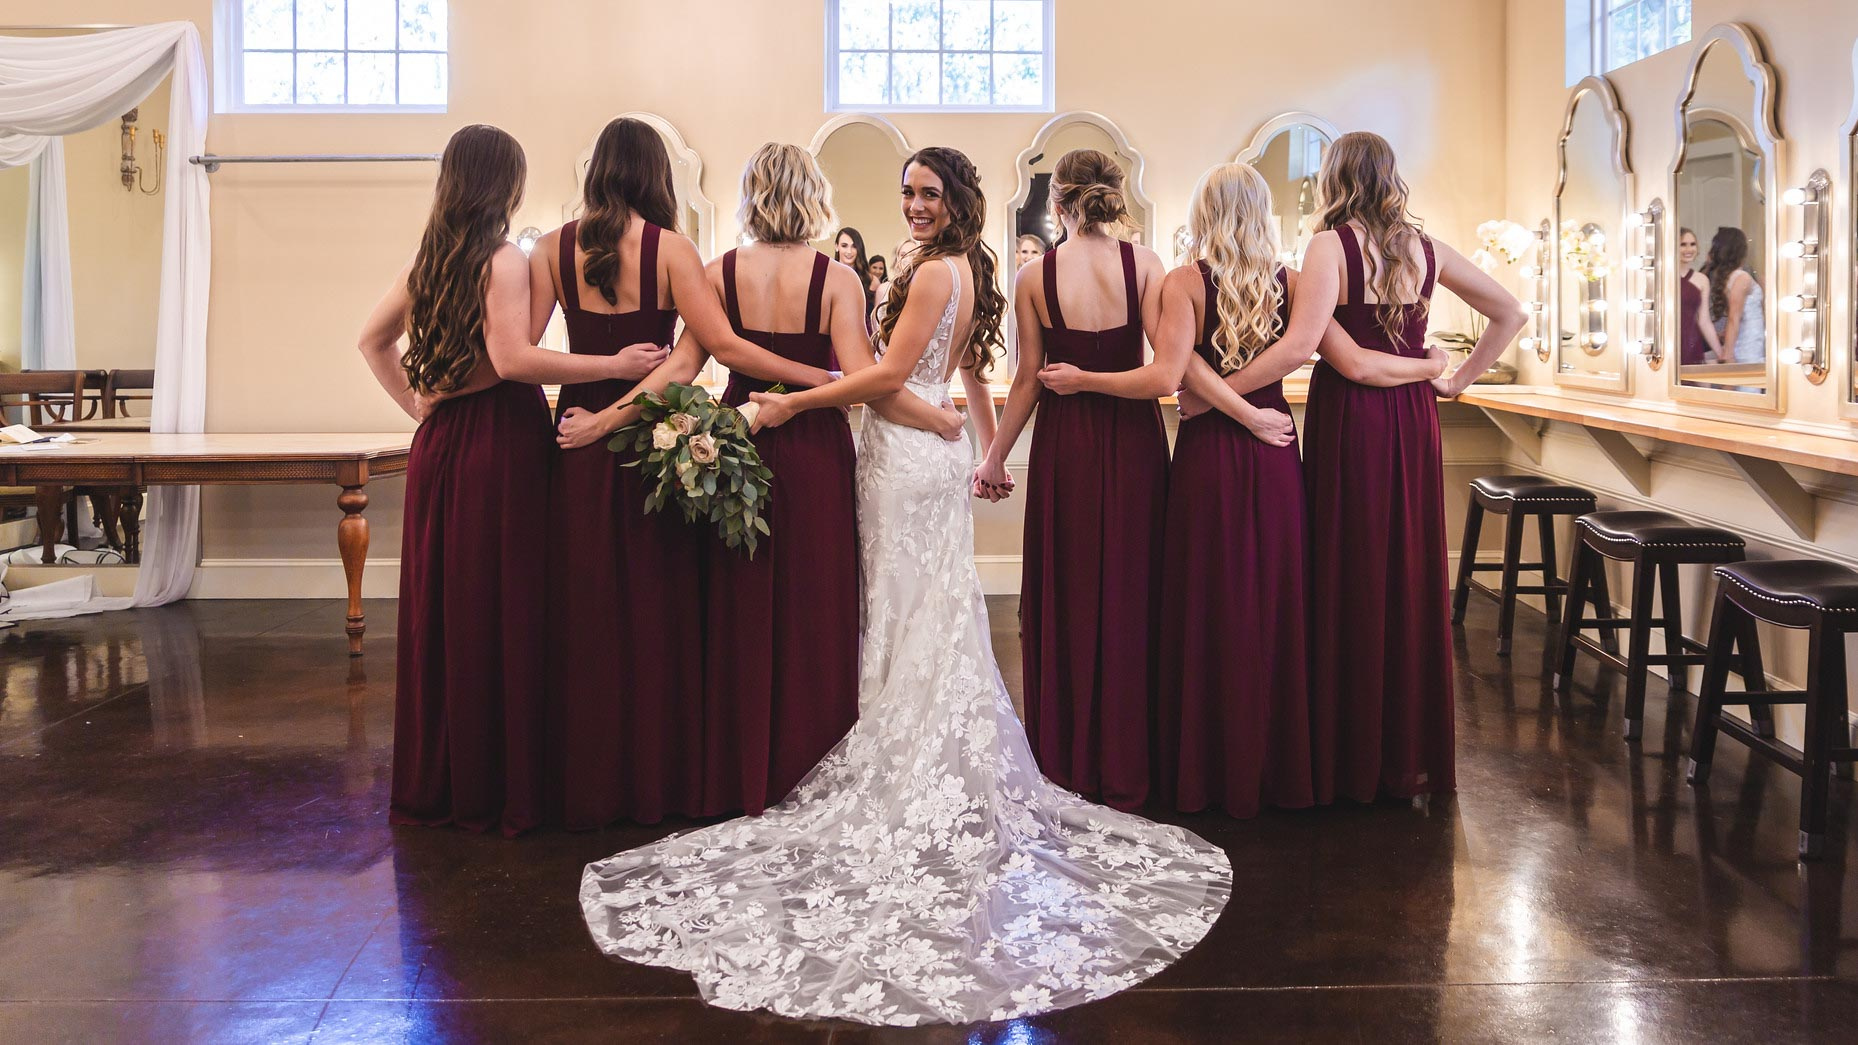 adam-szarmack-bowing-oaks-wedding-photographer-jacksonville-8.jpg